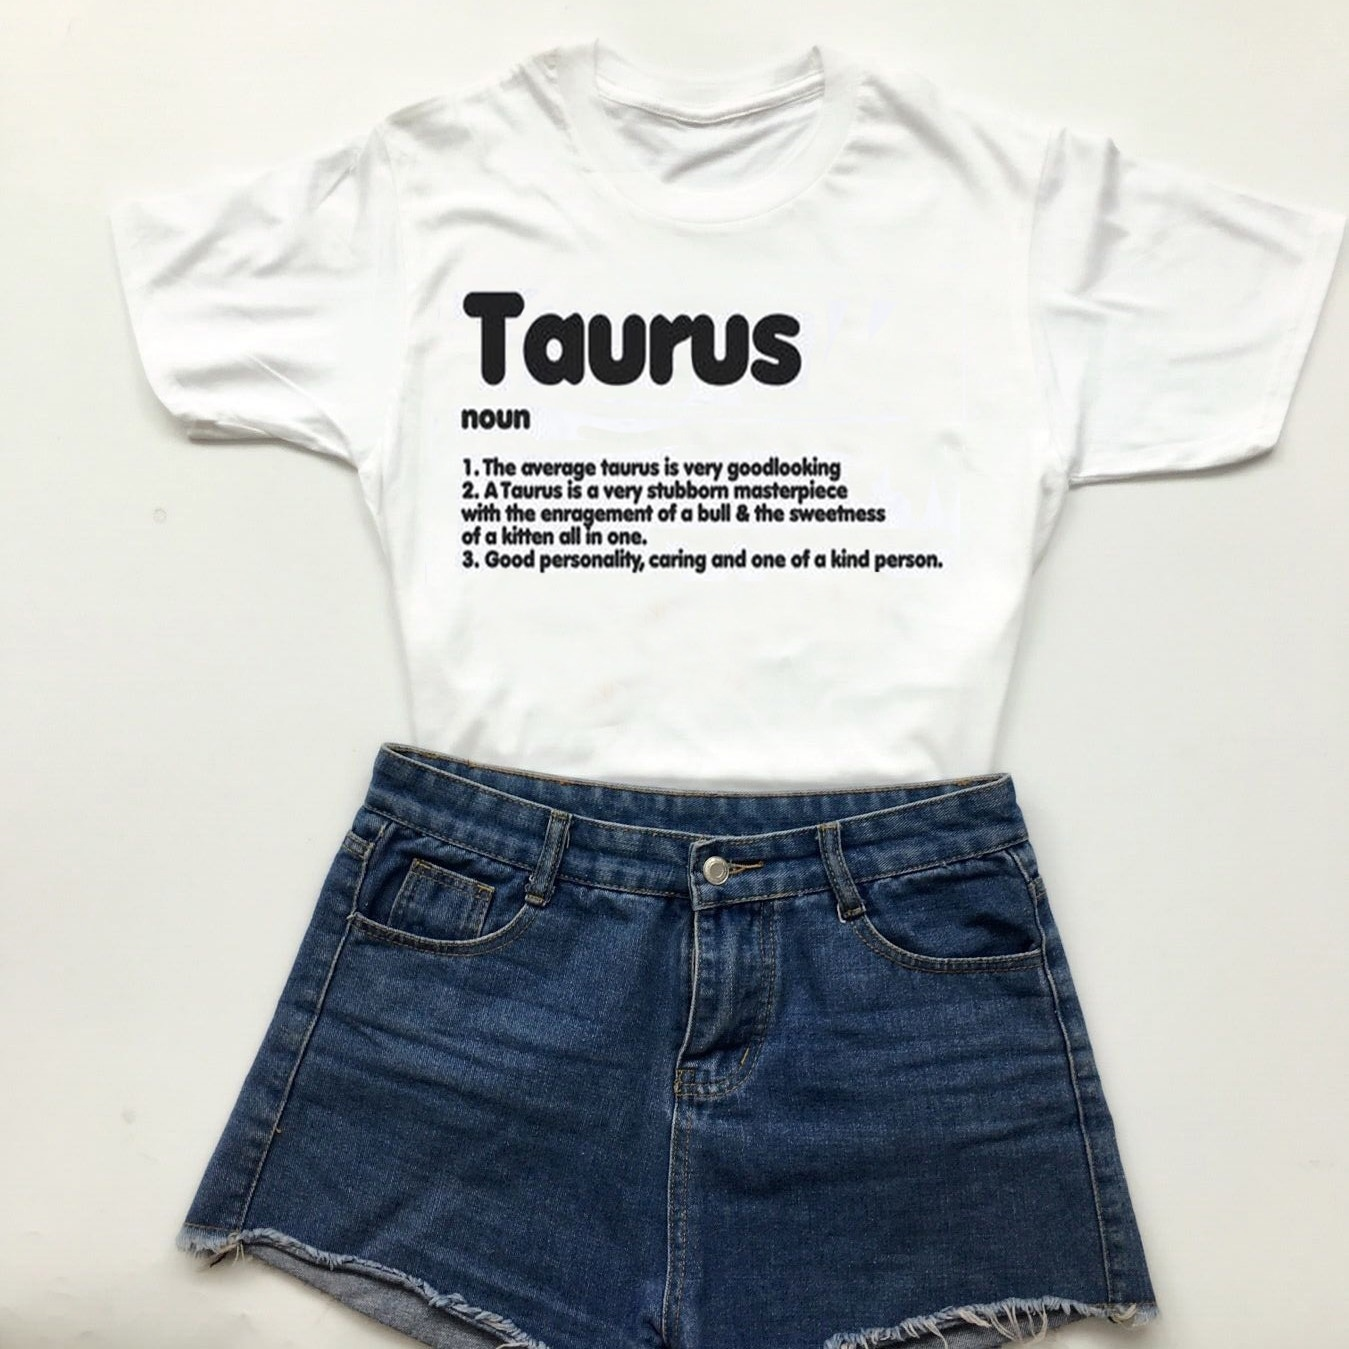 Hahayule-JBH Taurus T Shirt- Zodiac Sign Definition  Shirts- Taurus Shirt- Zodiacs